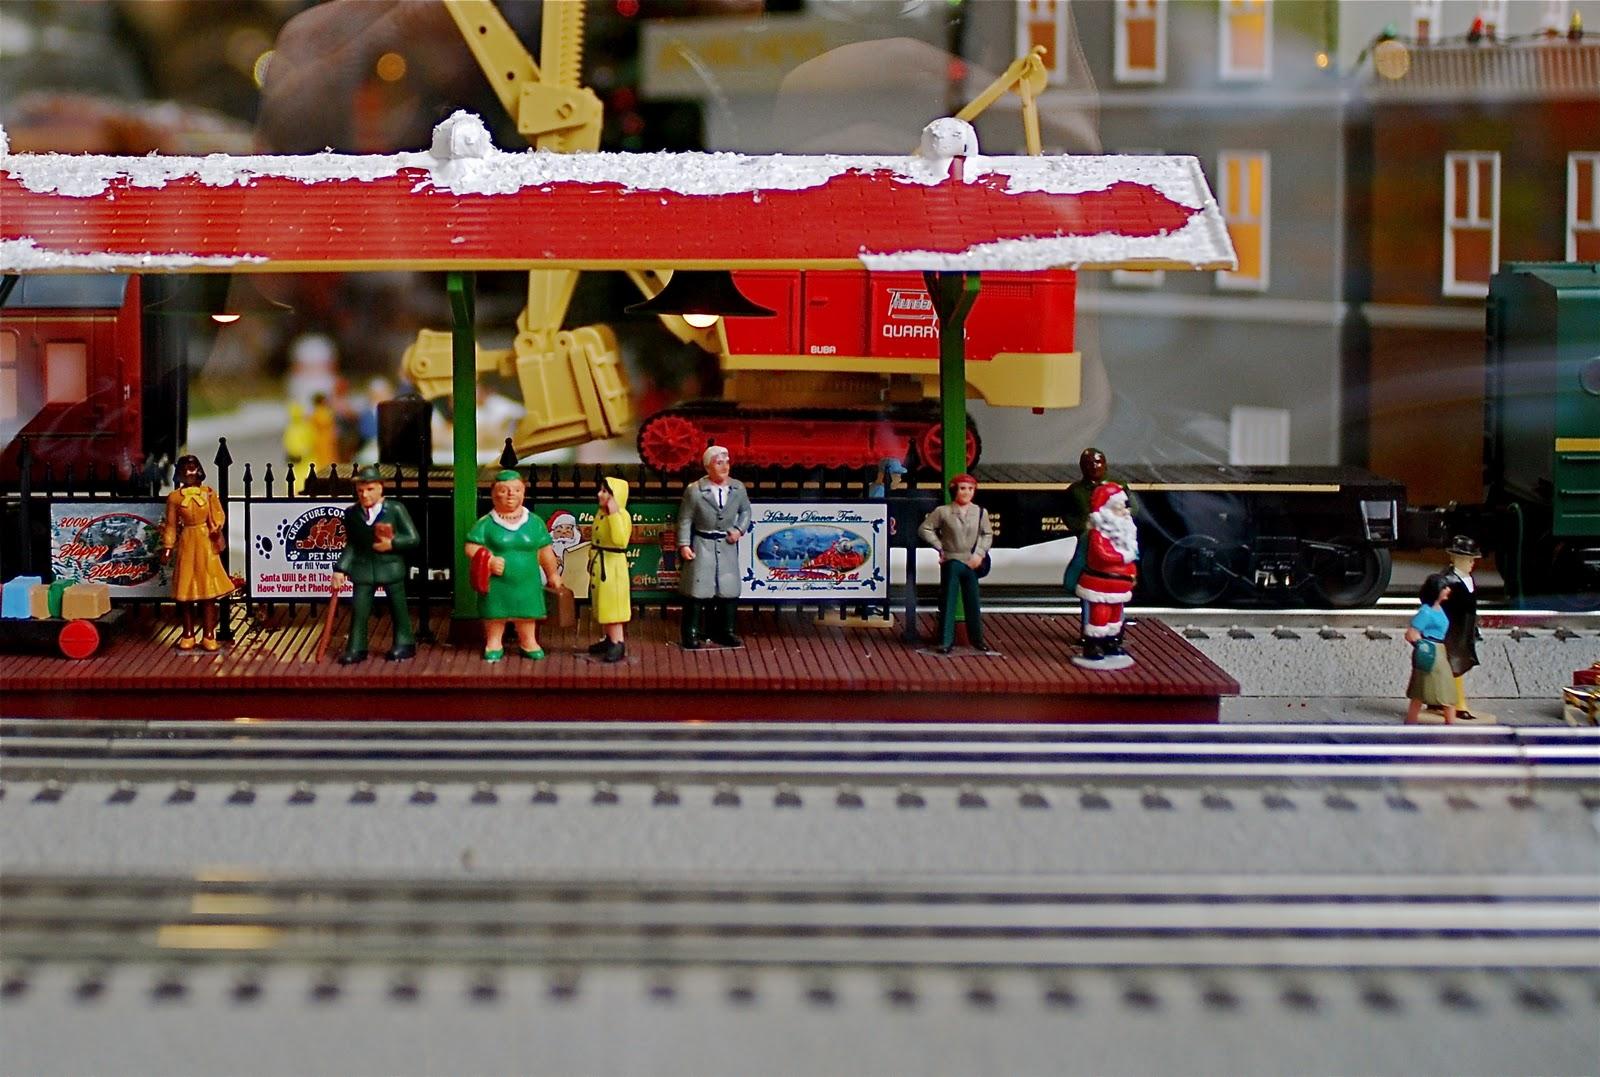 Lionel Displays Trains Store